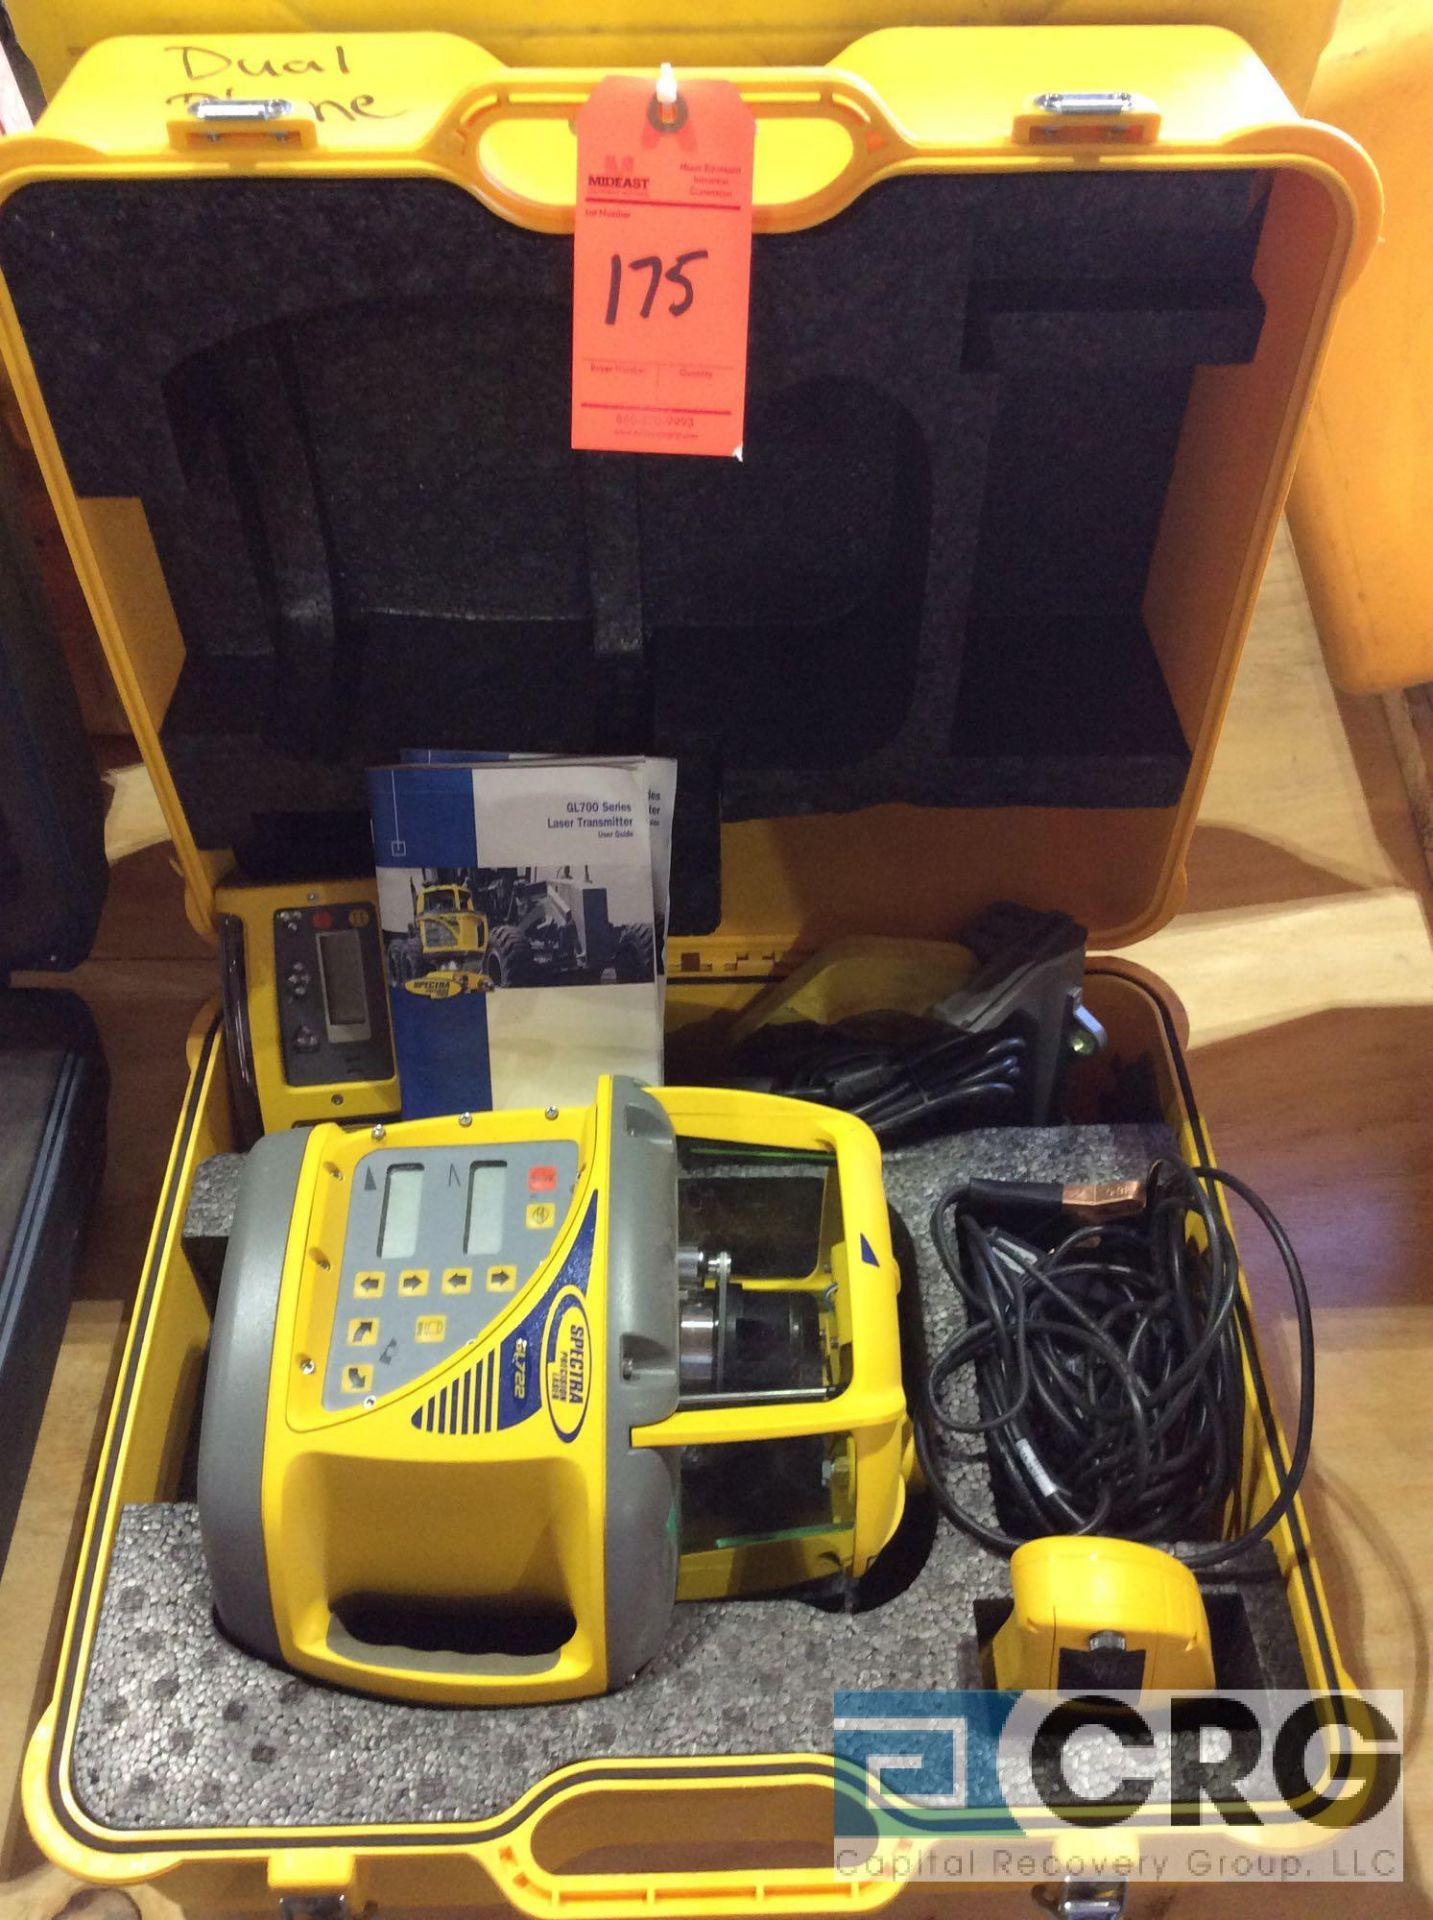 Lot 175 - Trimble GL722 Dual grade laser (works with Trimble Grade Control System)